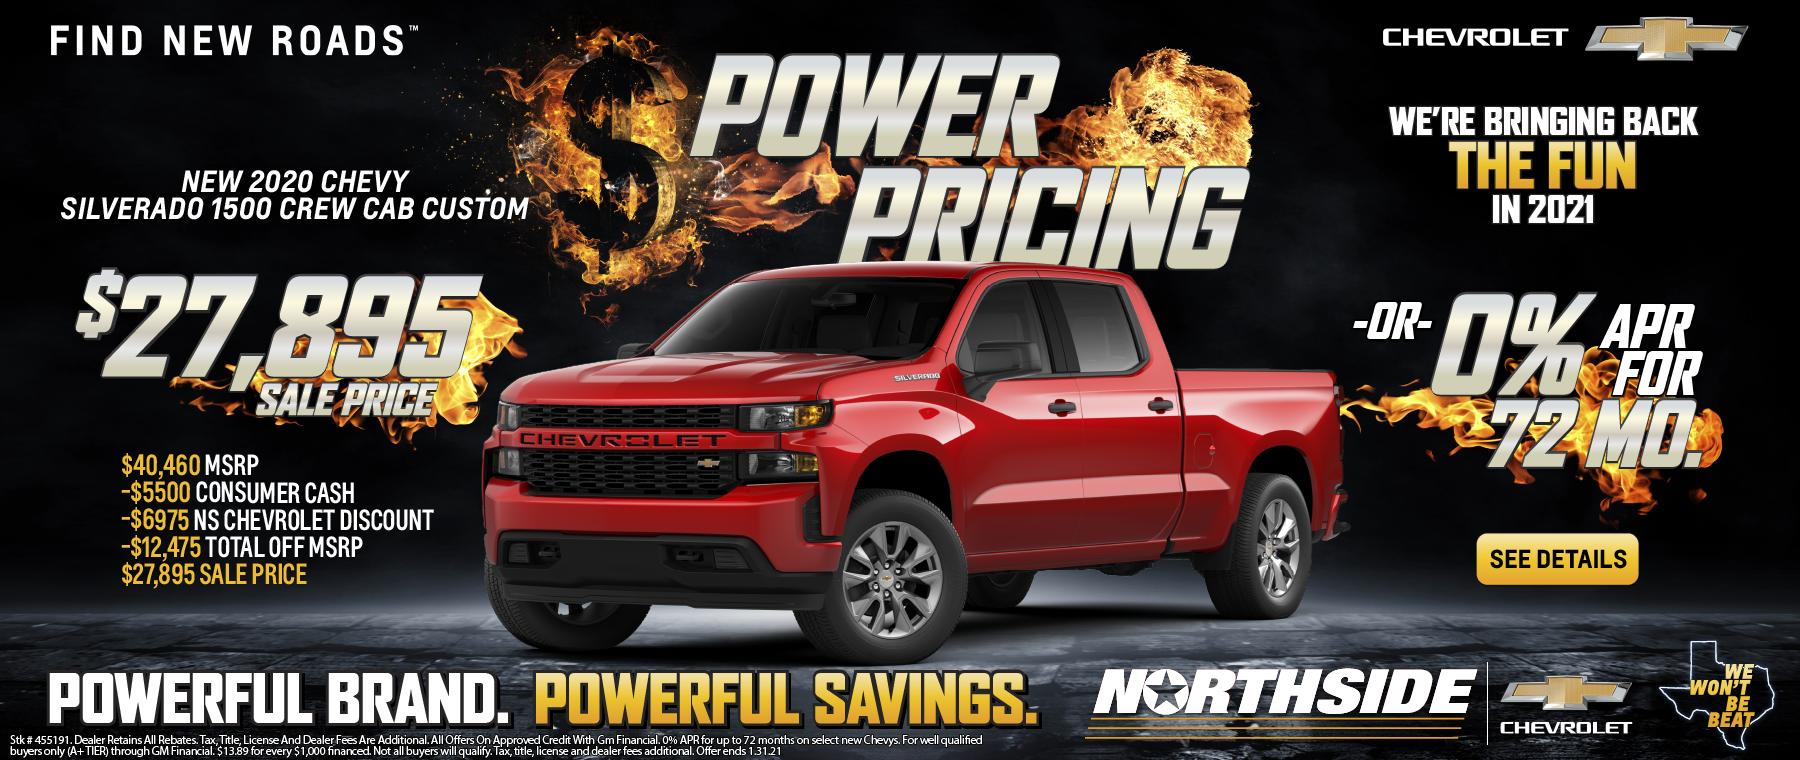 NS Chevy Silverado Power Pricing